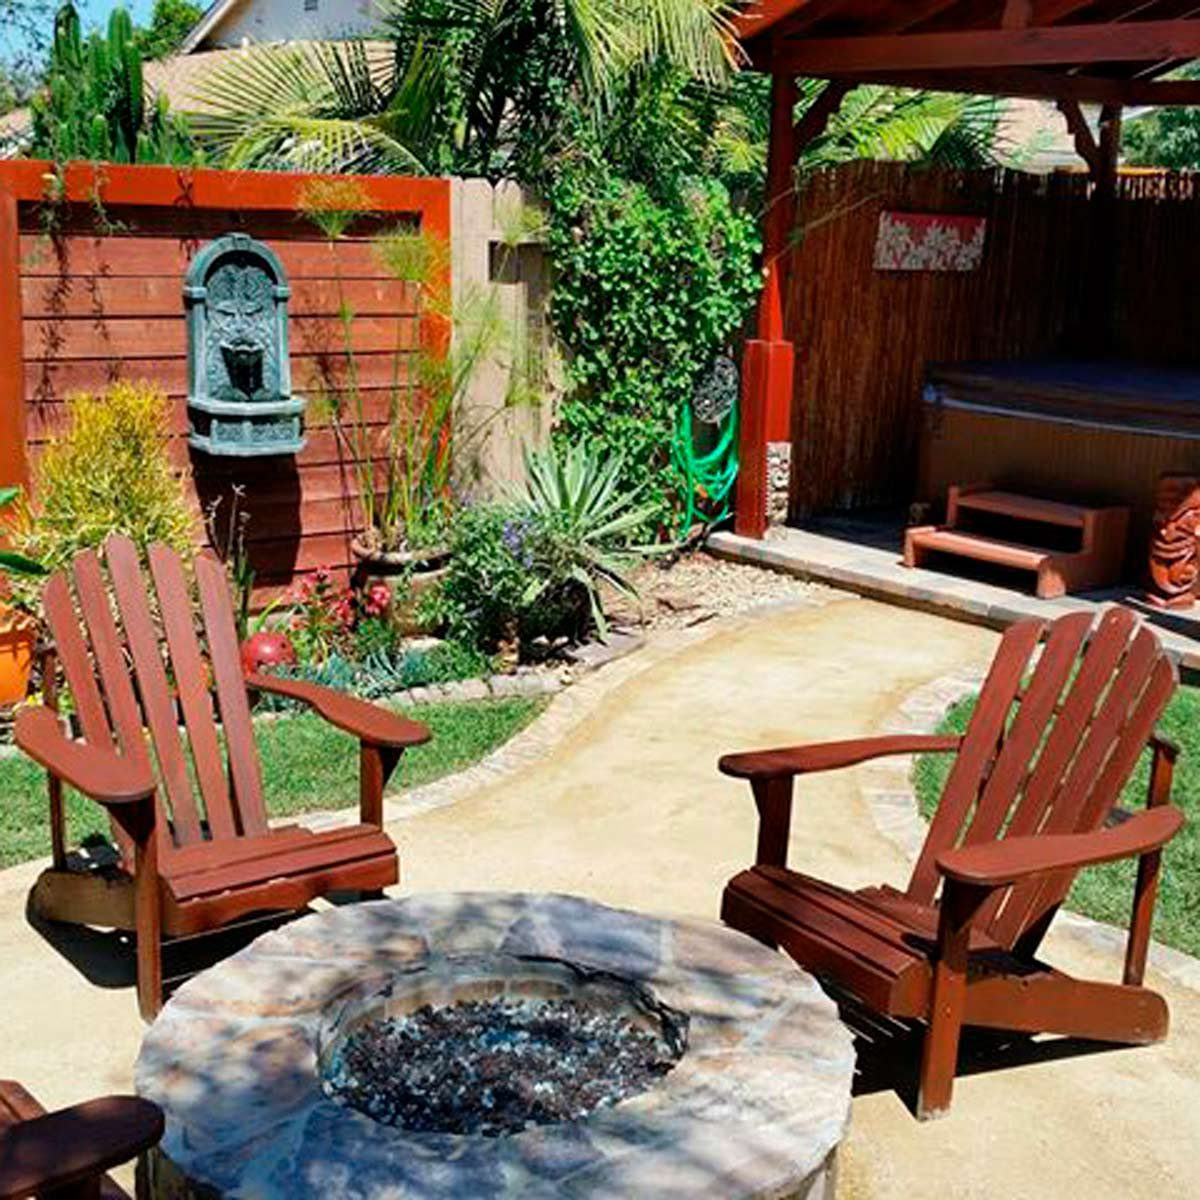 Cosmopolitan Diy Backyard Oasis Reader Diy Backyard Oasis Family Handyman Diy Backyard Oasis Ideas Diy Backyard Oasis Pinterest outdoor Diy Backyard Oasis